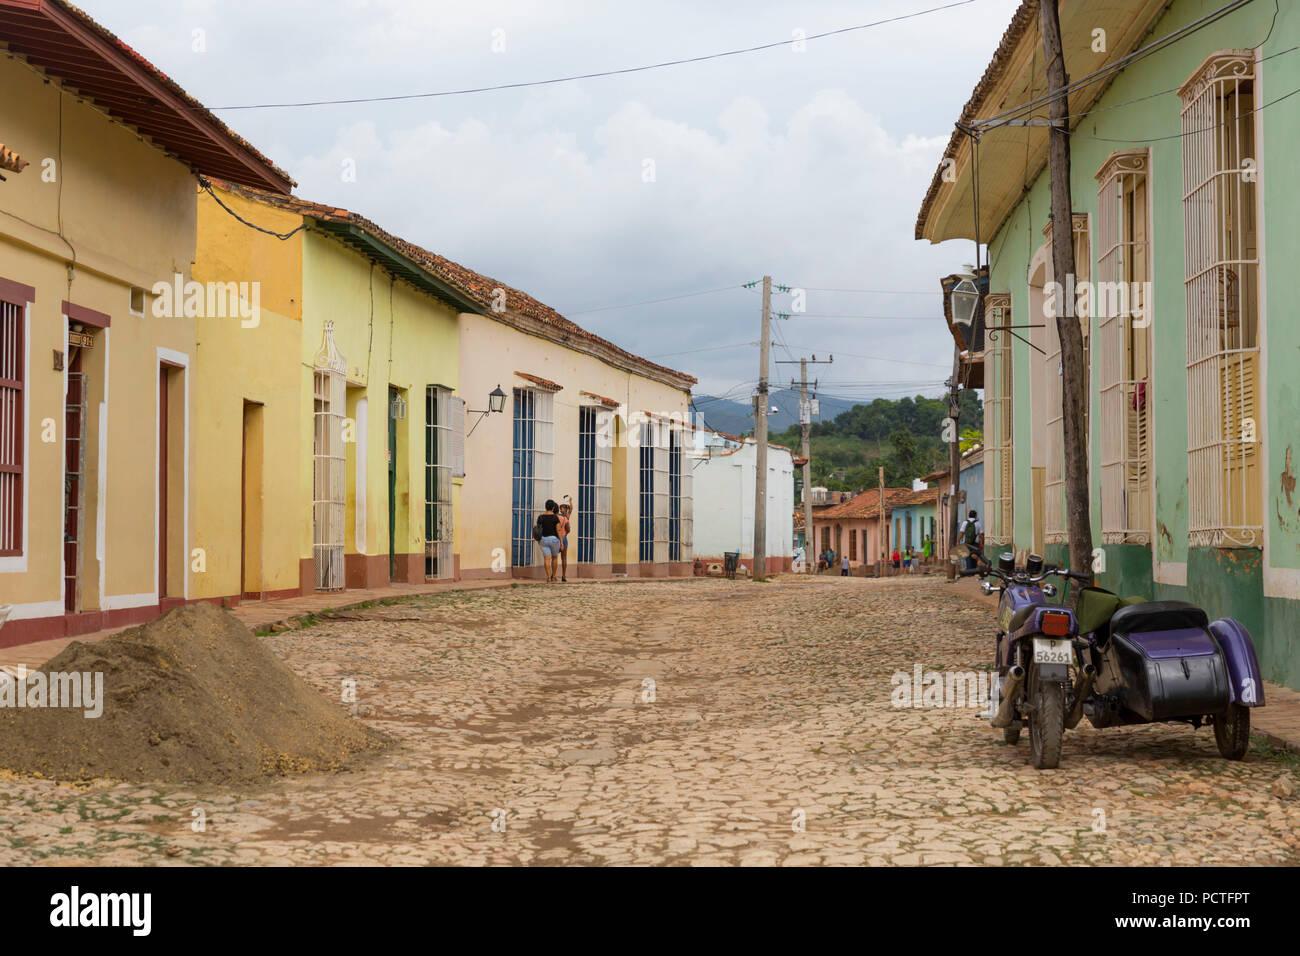 Typical street scene, Trinidad, Province Sancti Spiritus, Cuba, Republic of Cuba, Greater Antilles, Caribbean - Stock Image